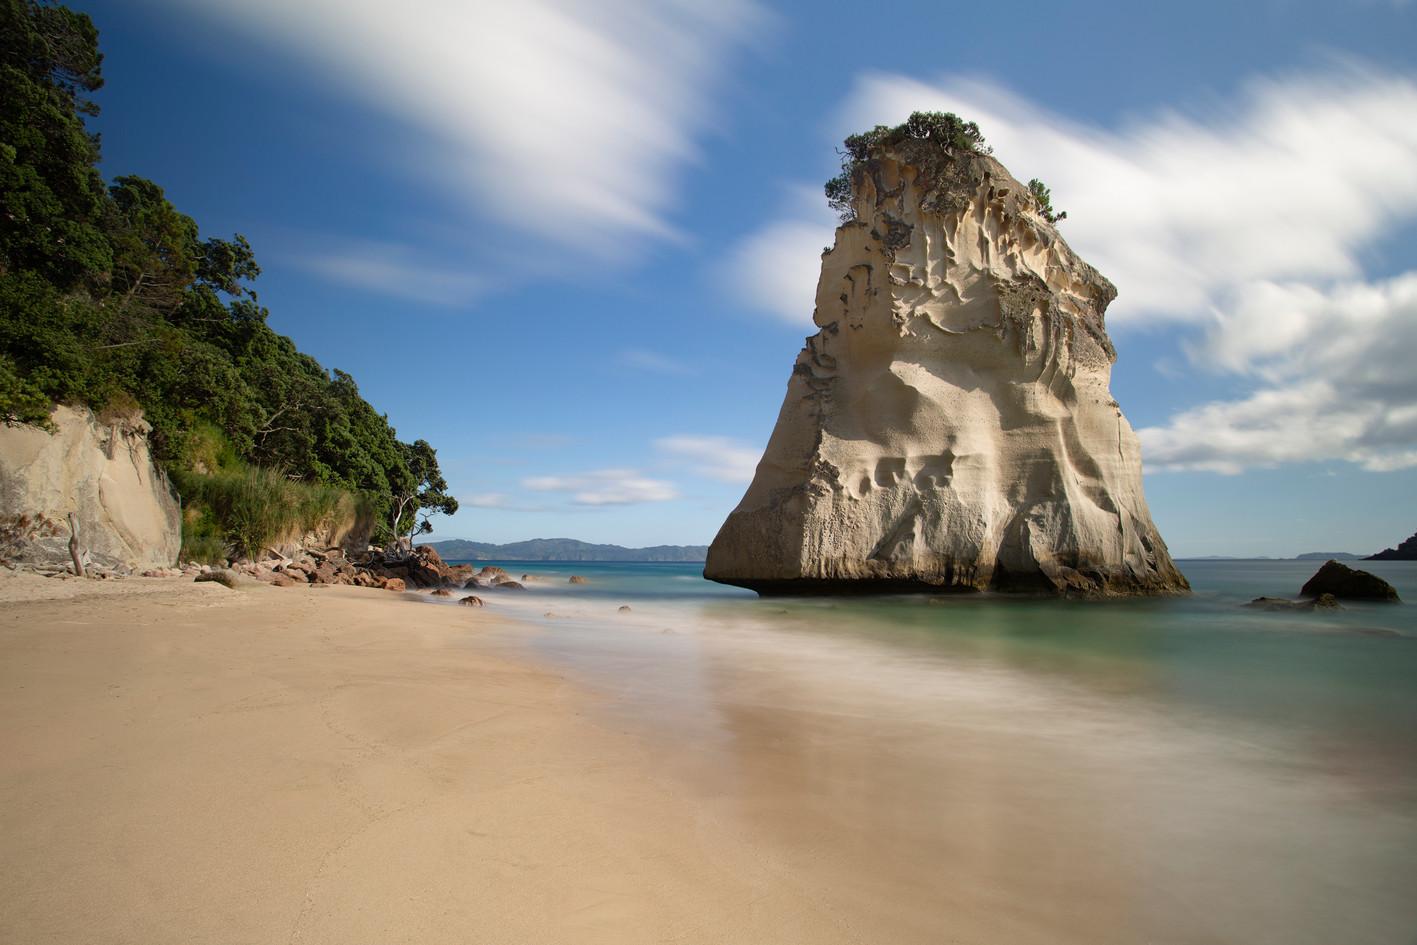 Te Horo Rock, Cathedral Cove, Coromandel Peninsula